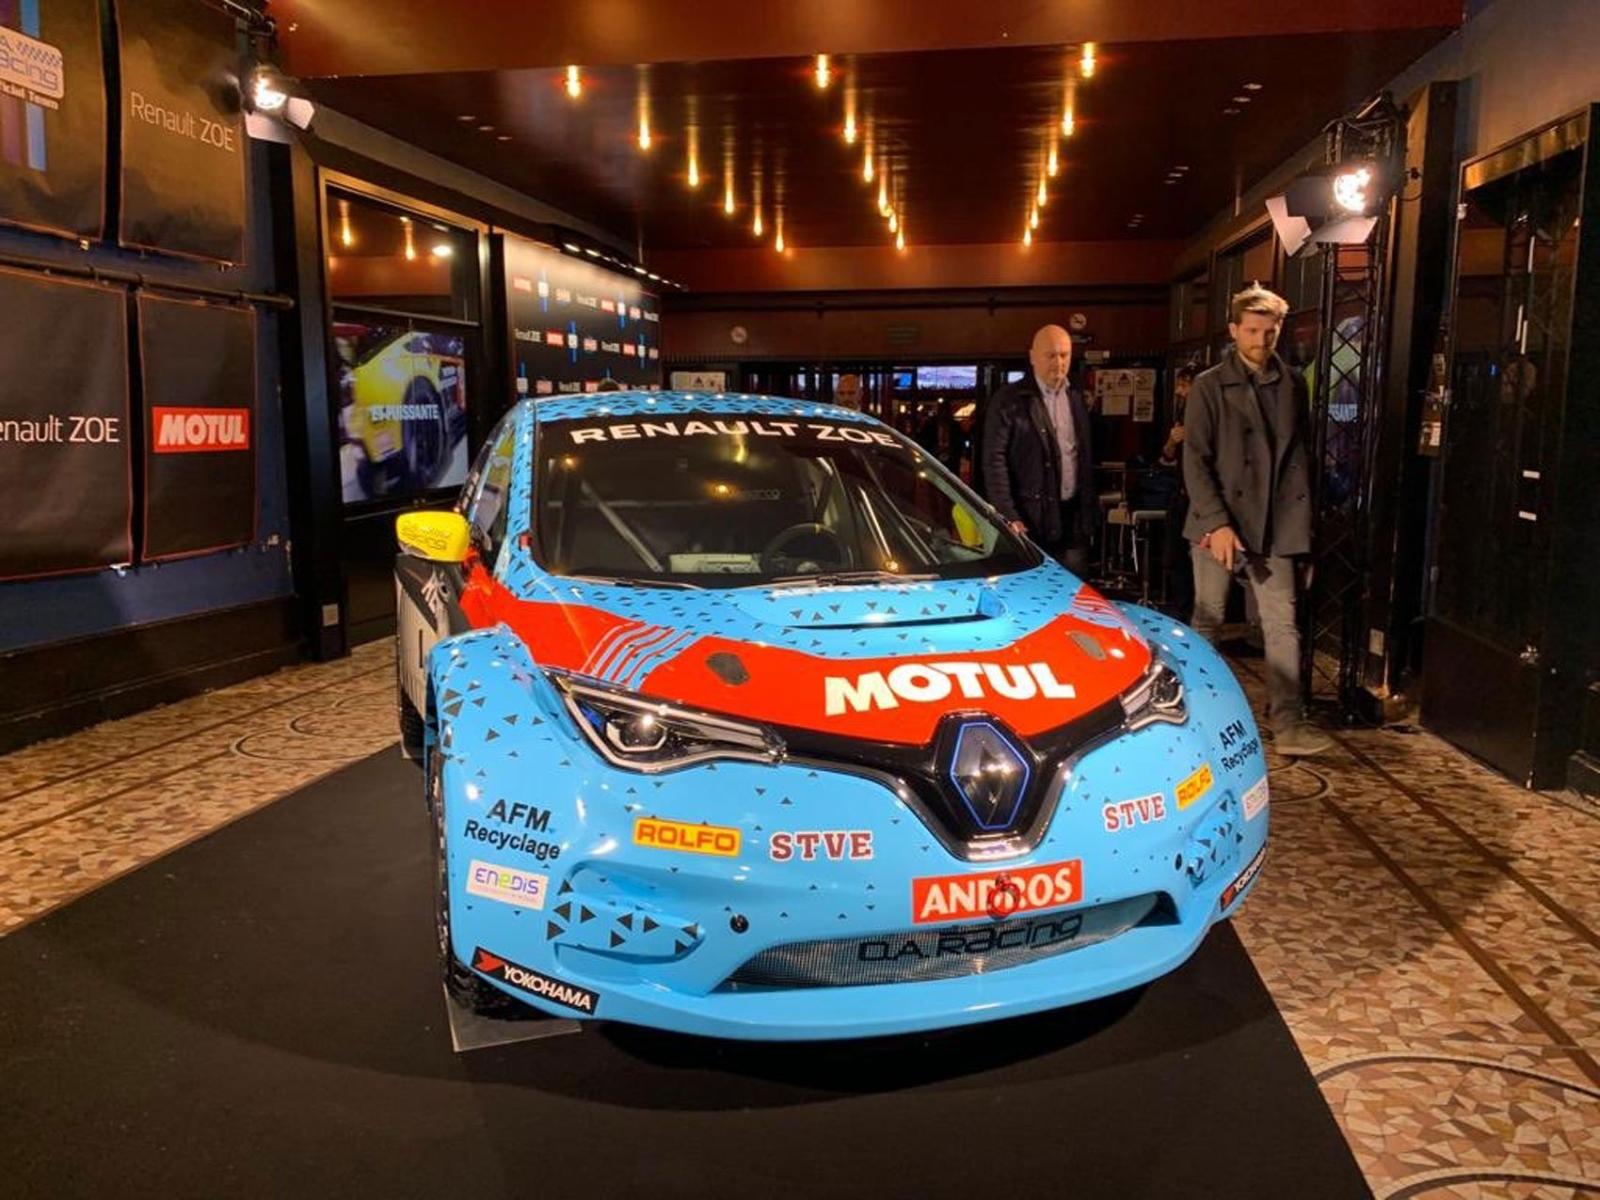 2020-renault-zoe-electric-racer-andors-trophy-3